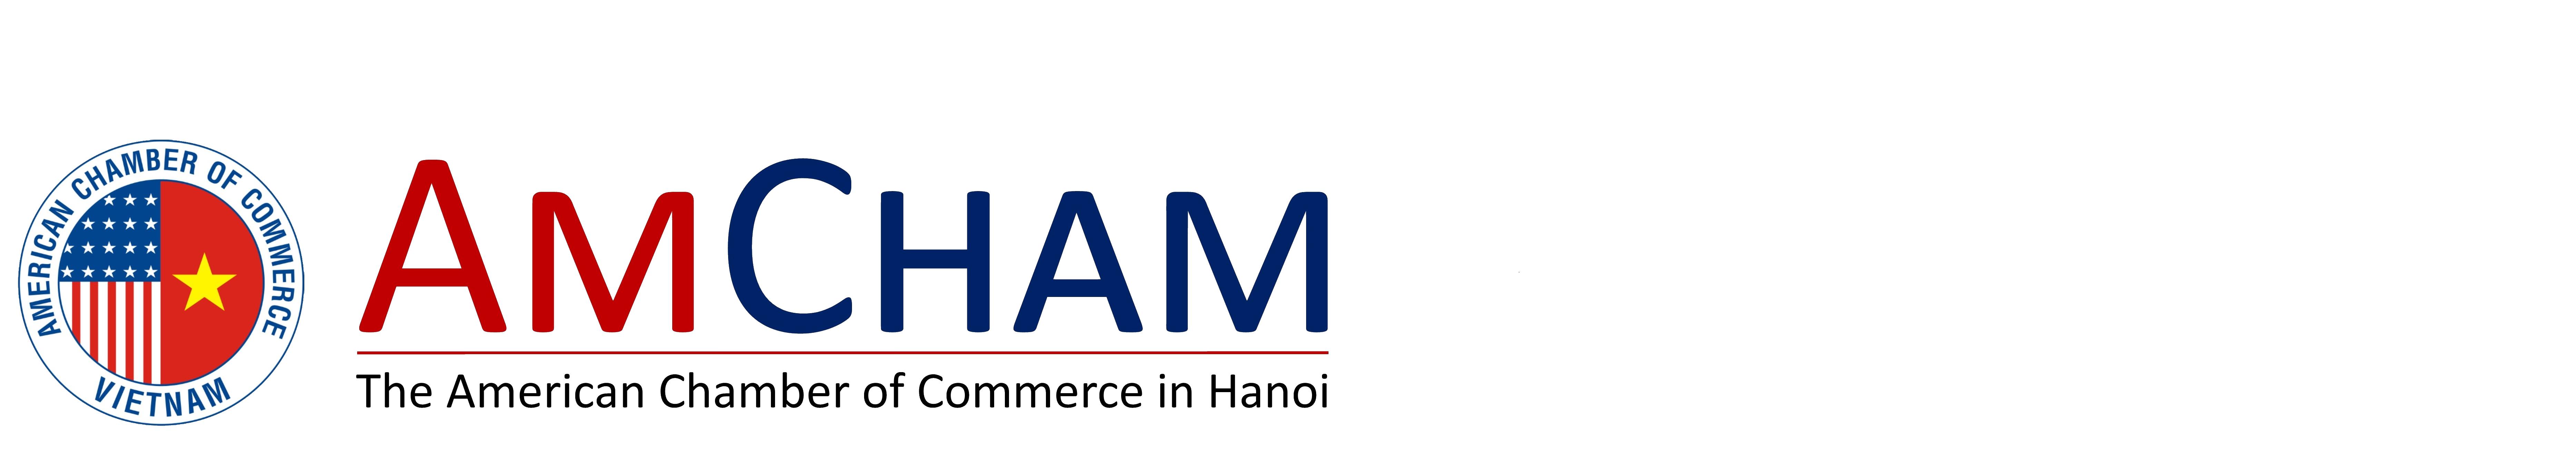 AmCham Hanoi